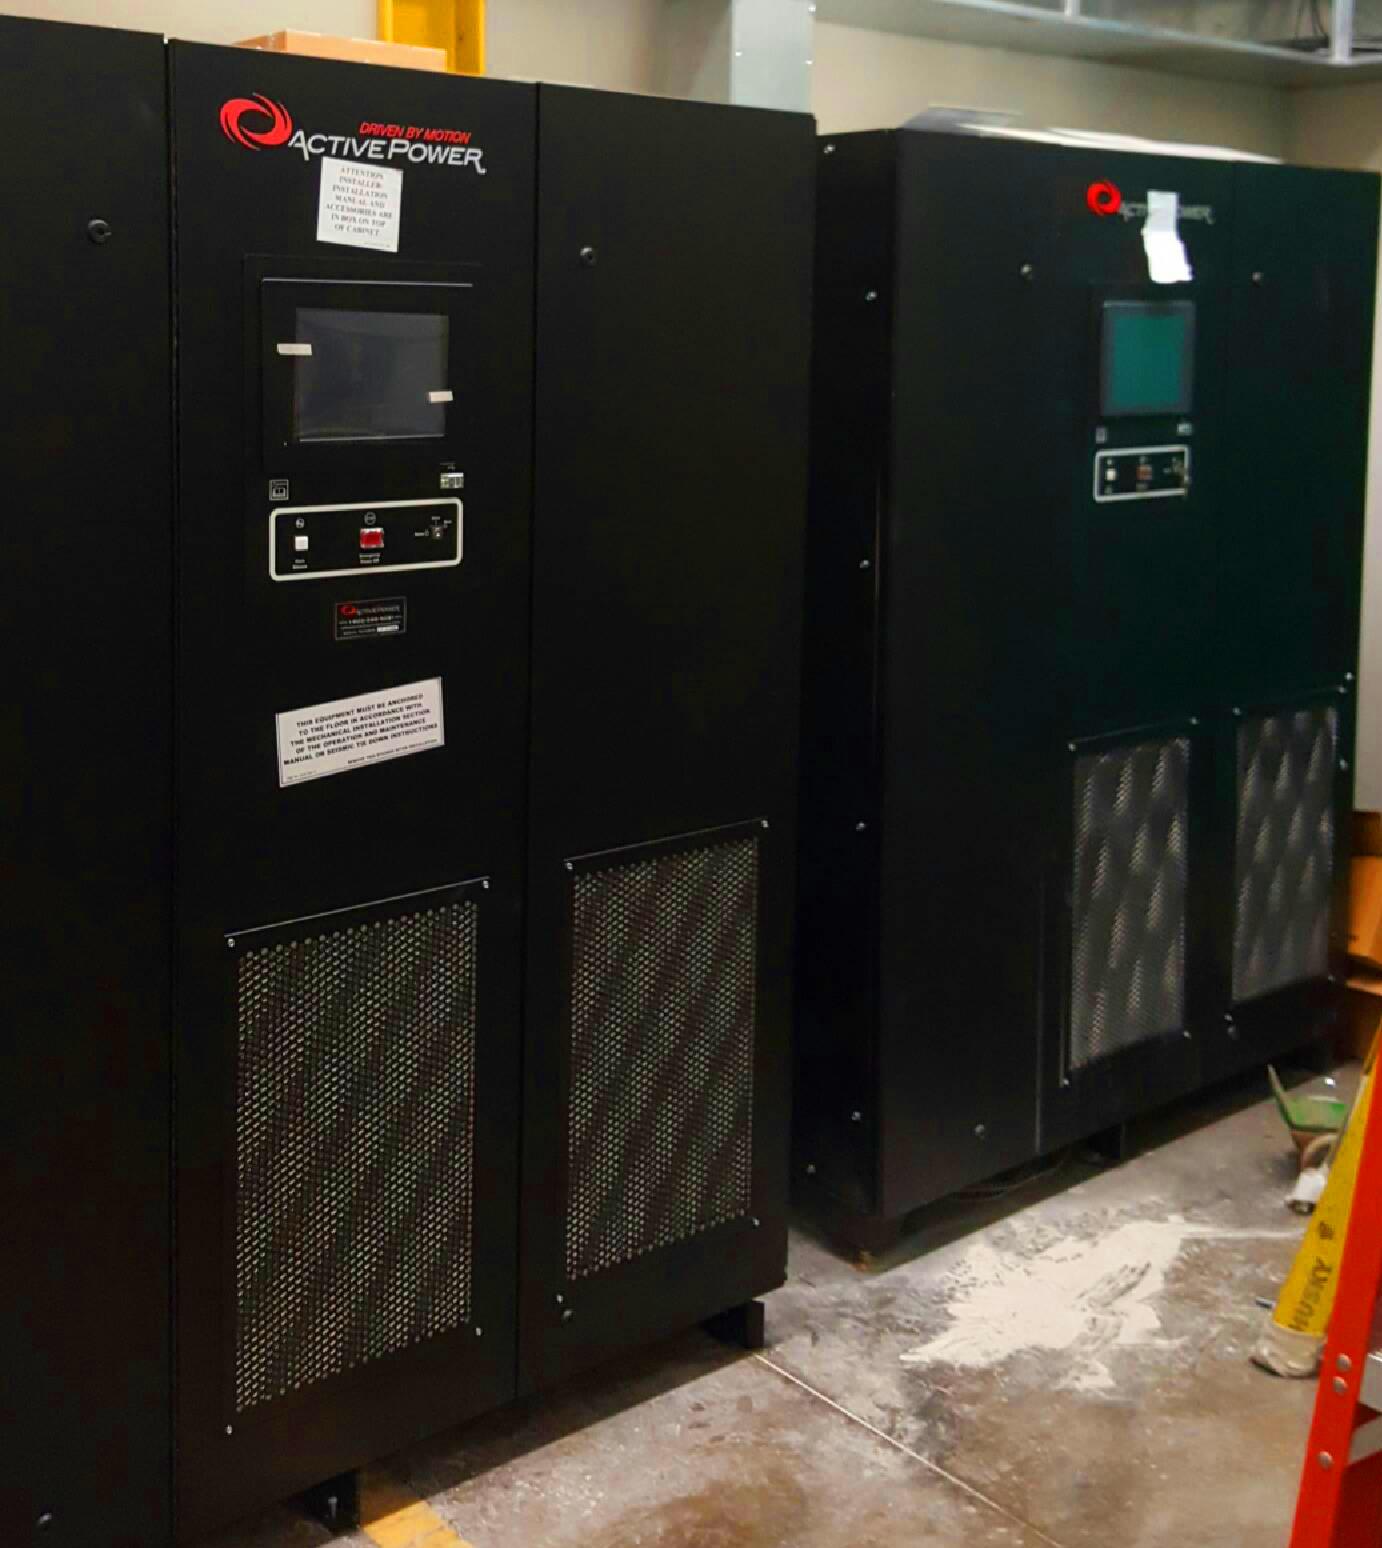 Commercial, Industrial Generators in Annapolis, Glen Burnie, Arnold, Severna Park, Pasadena Maryland